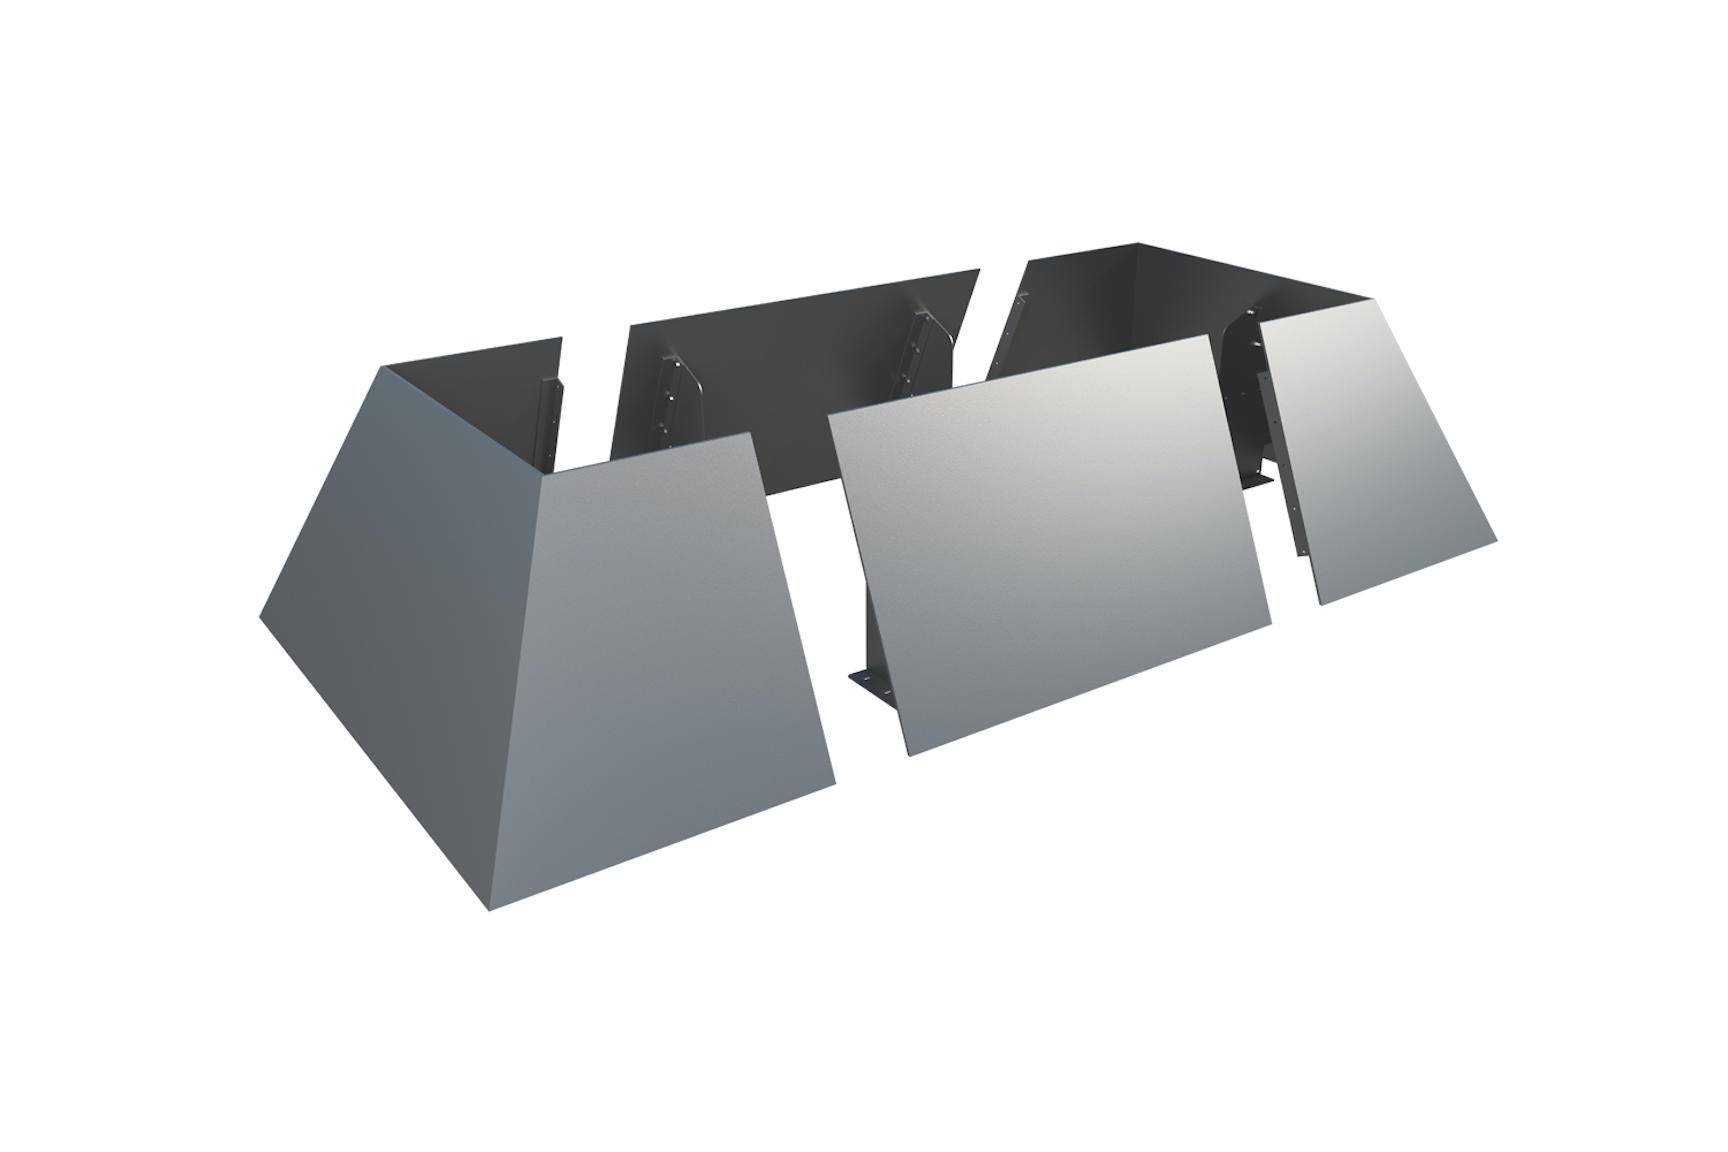 Angular Planter Walls - Stainless Steel